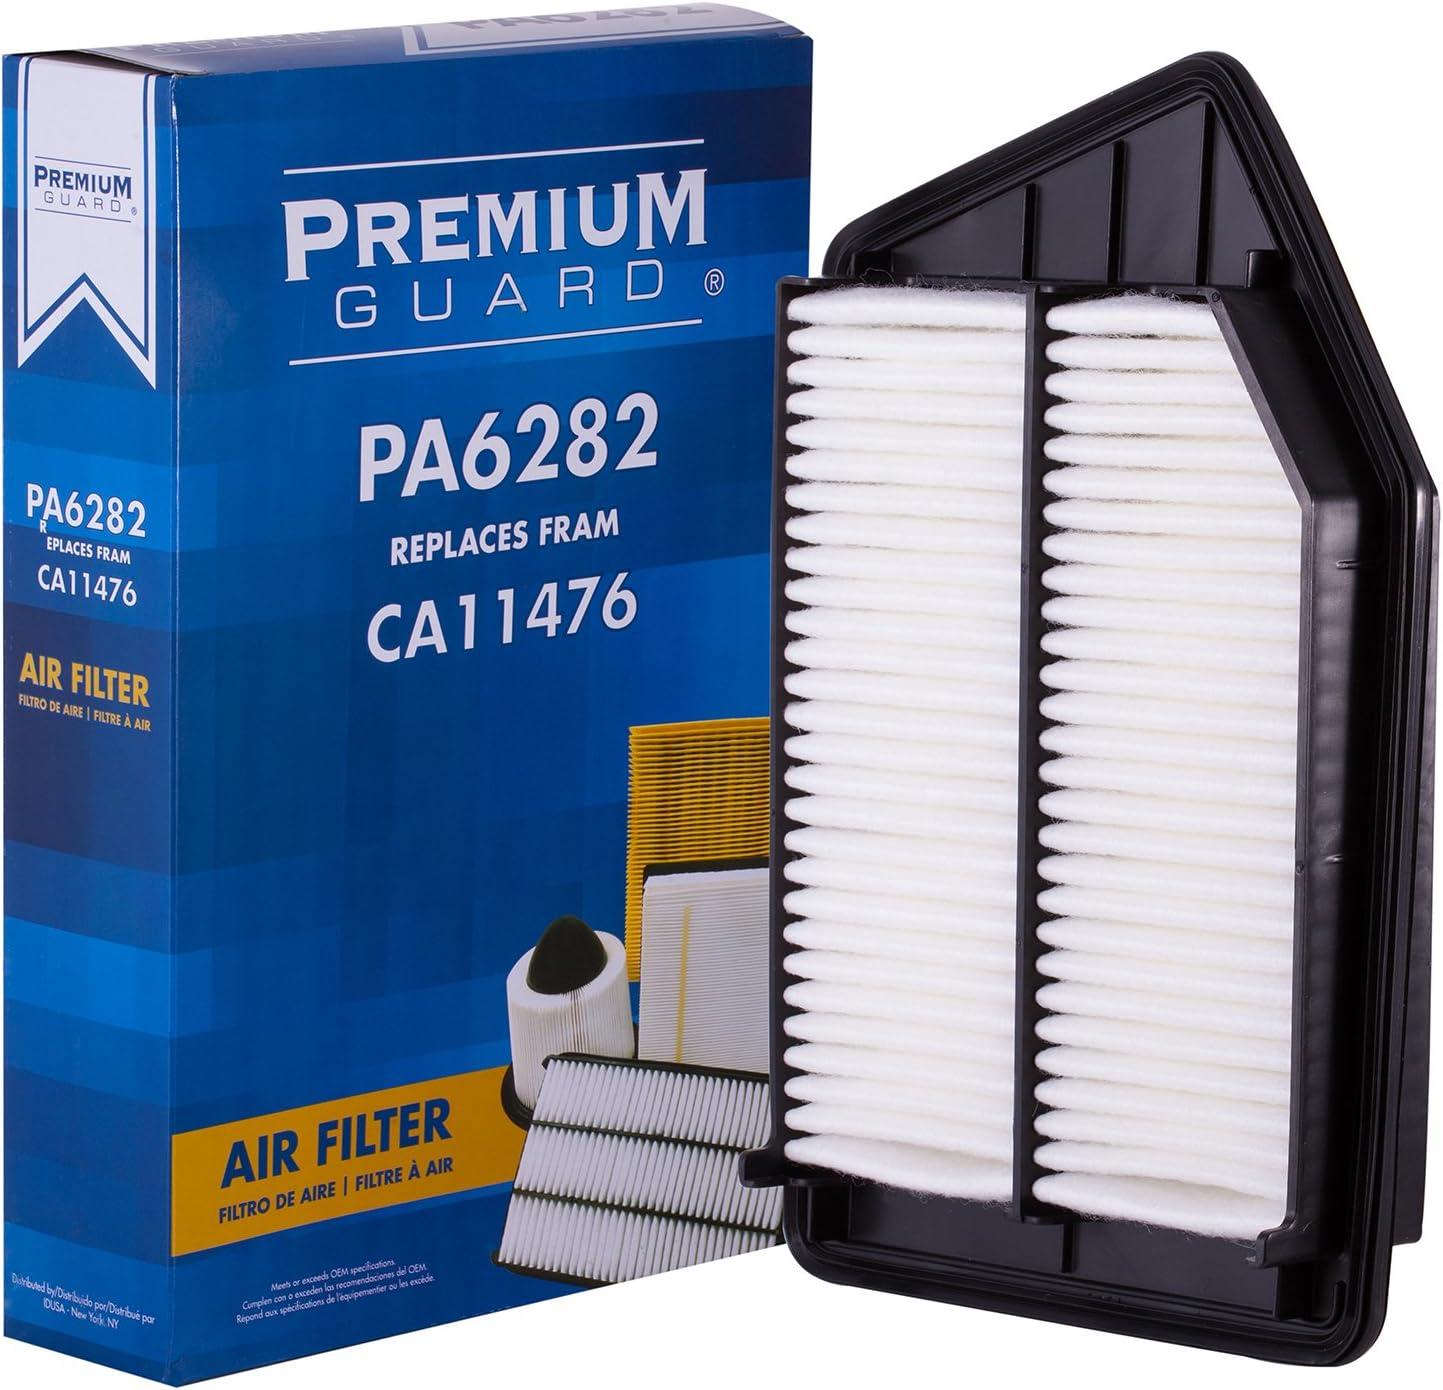 Prime Choice Auto Parts SLK2209-2210 2 Front Sway Bar Links